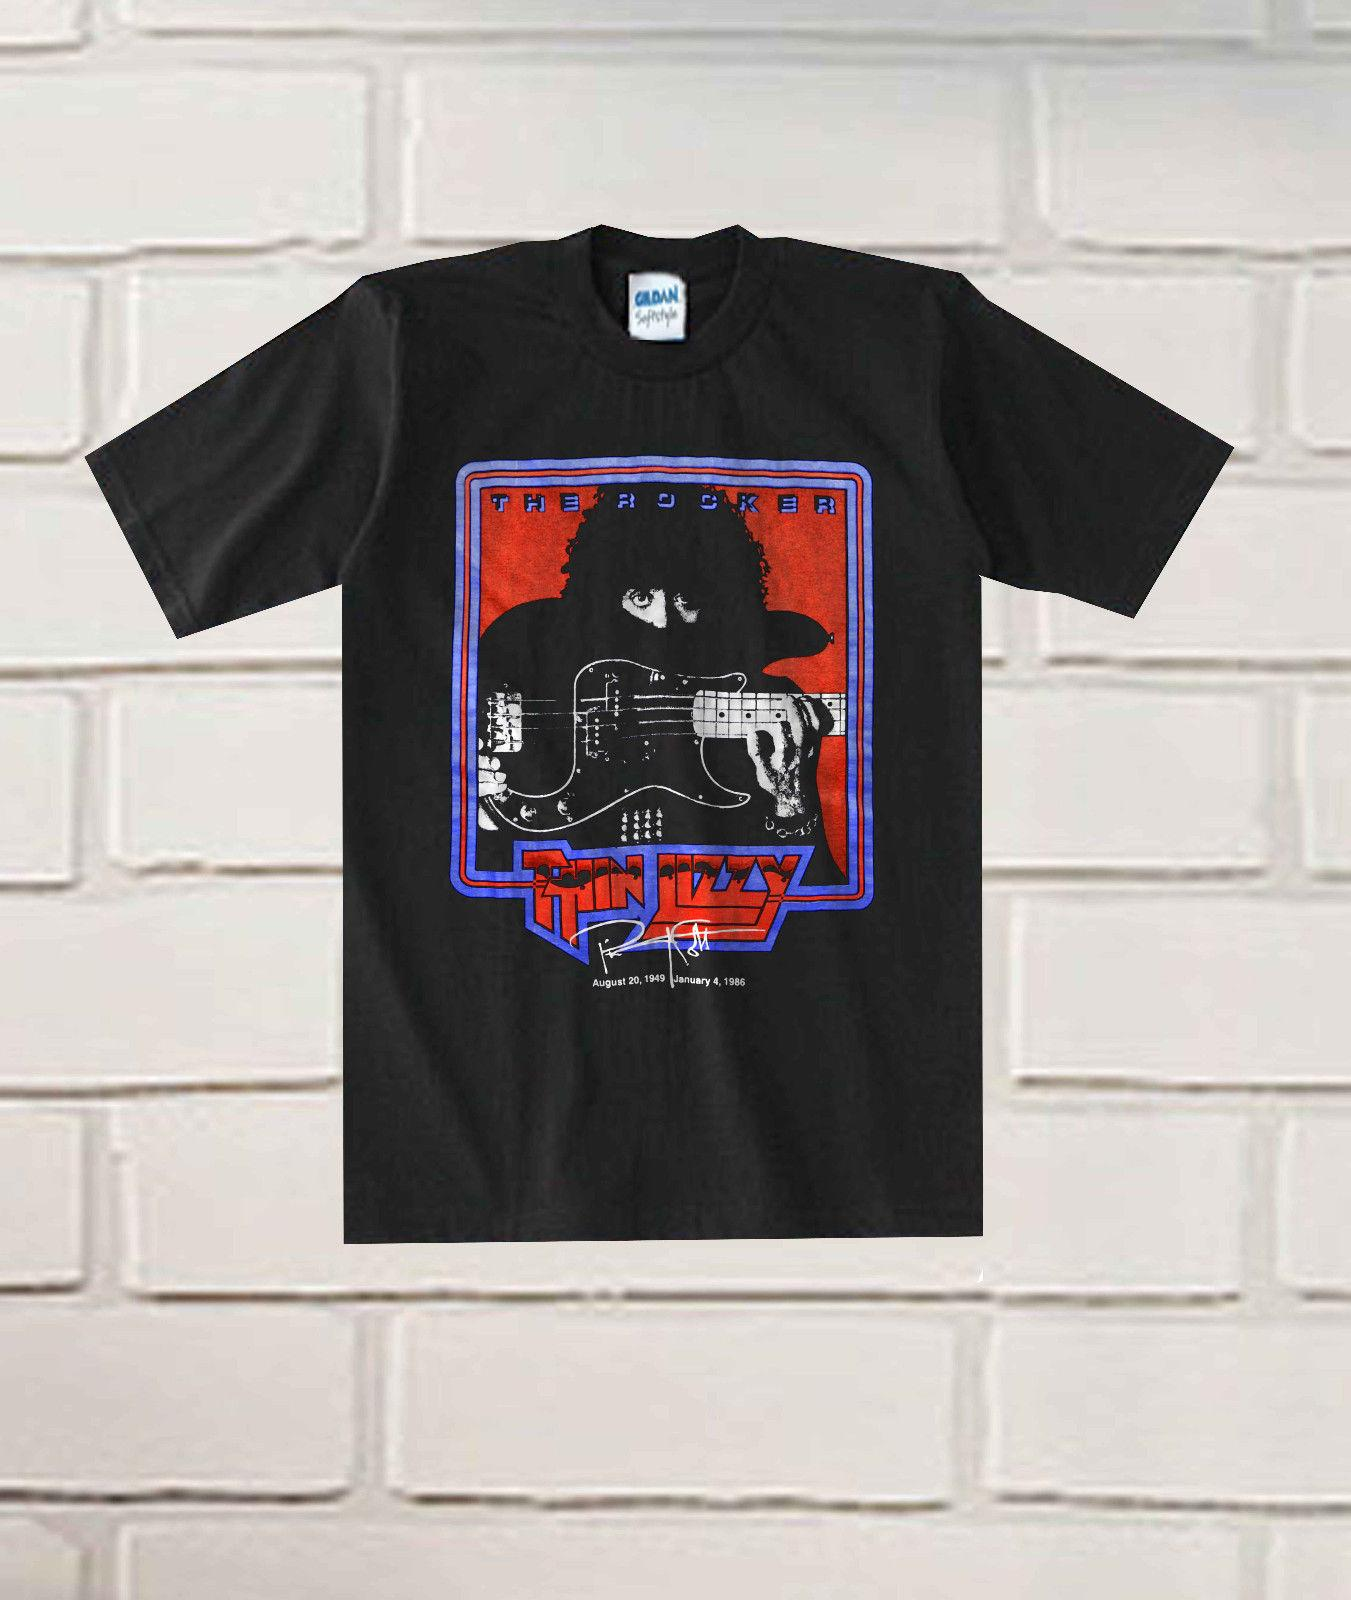 2e0f0b4ecec New Popular Vintage 1990s Thin Lizzy Phil Lynott T Shirt New High Quality  Top Tee Print T Shirt Summer Style 100% Cotton Casual T Shirts Online White  Shirt ...